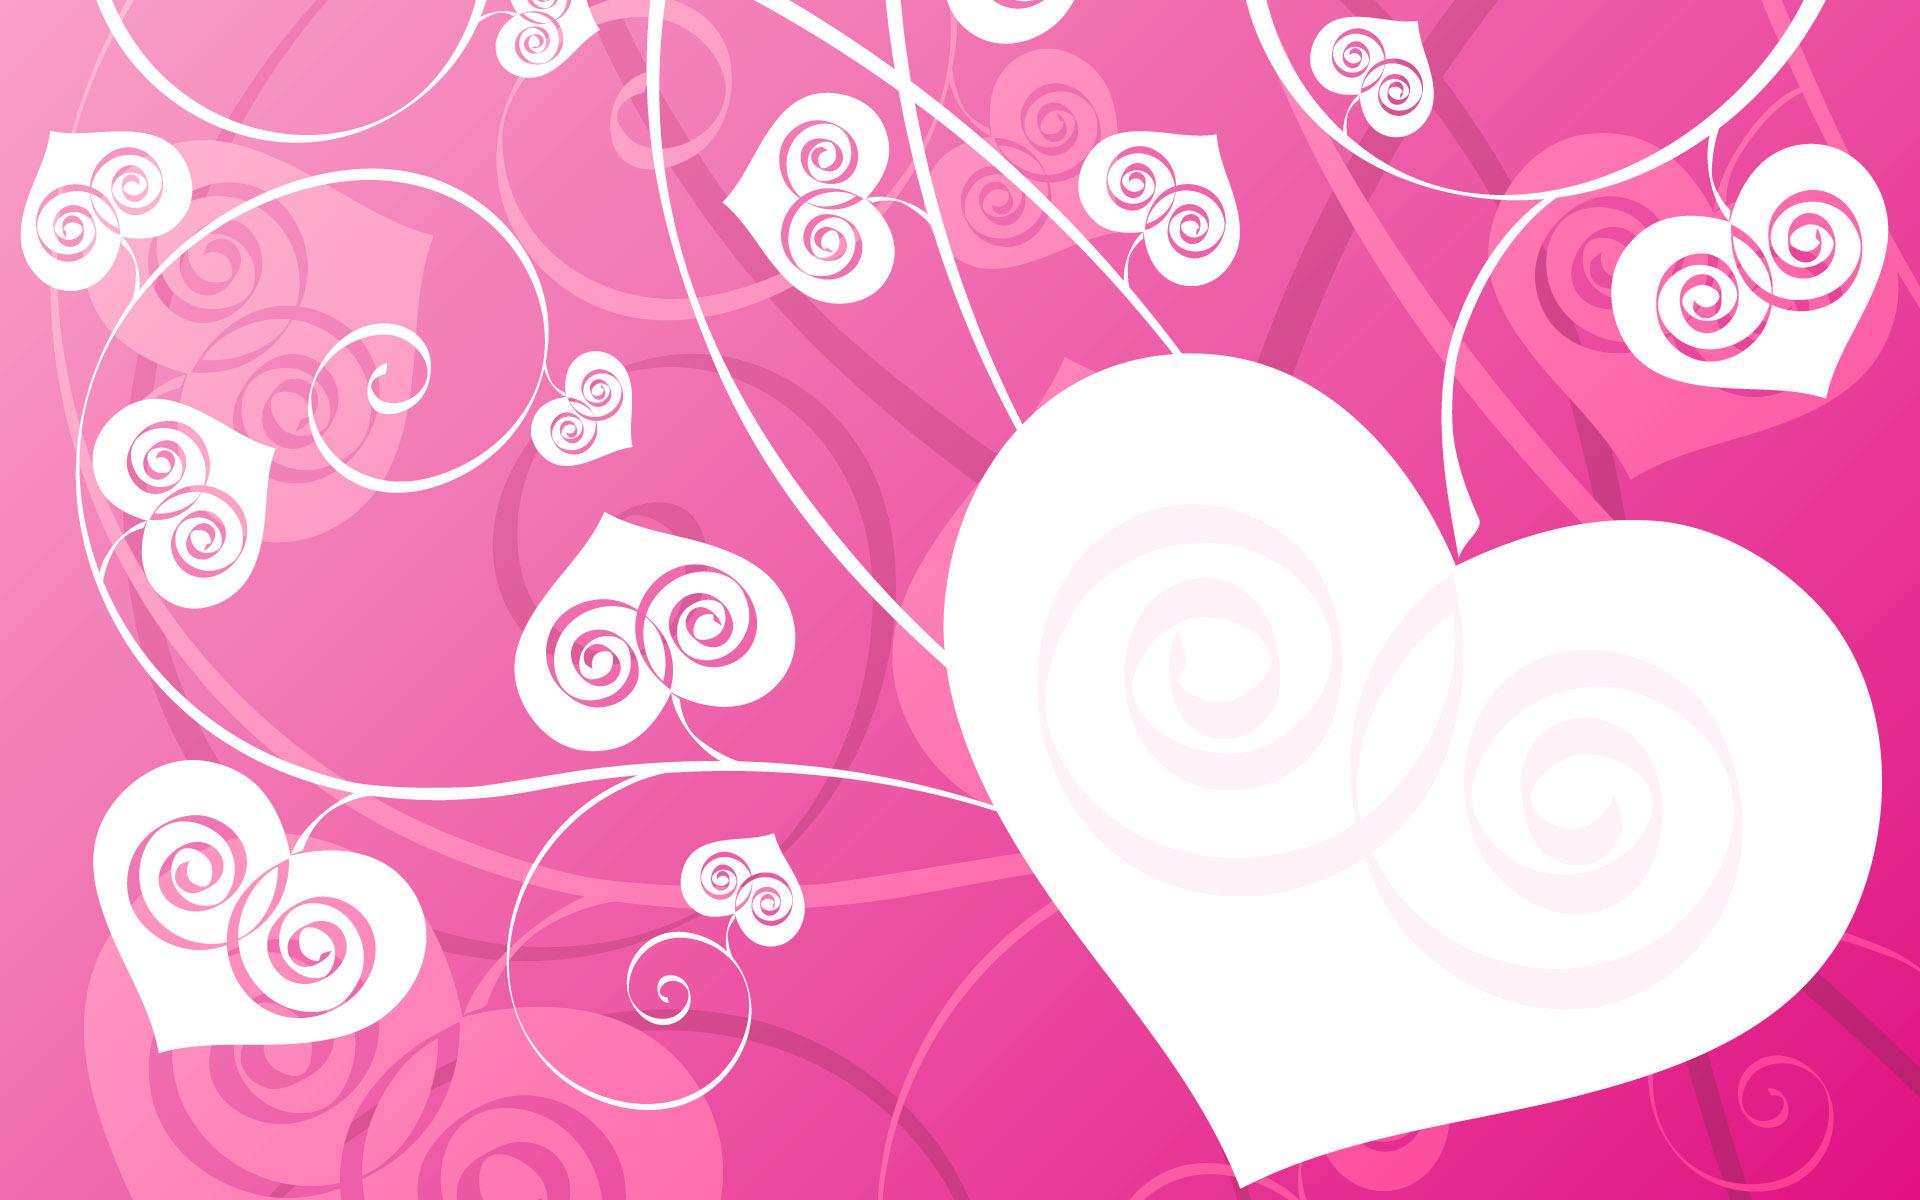 Love Wallpaper love 4187475 1920 1200